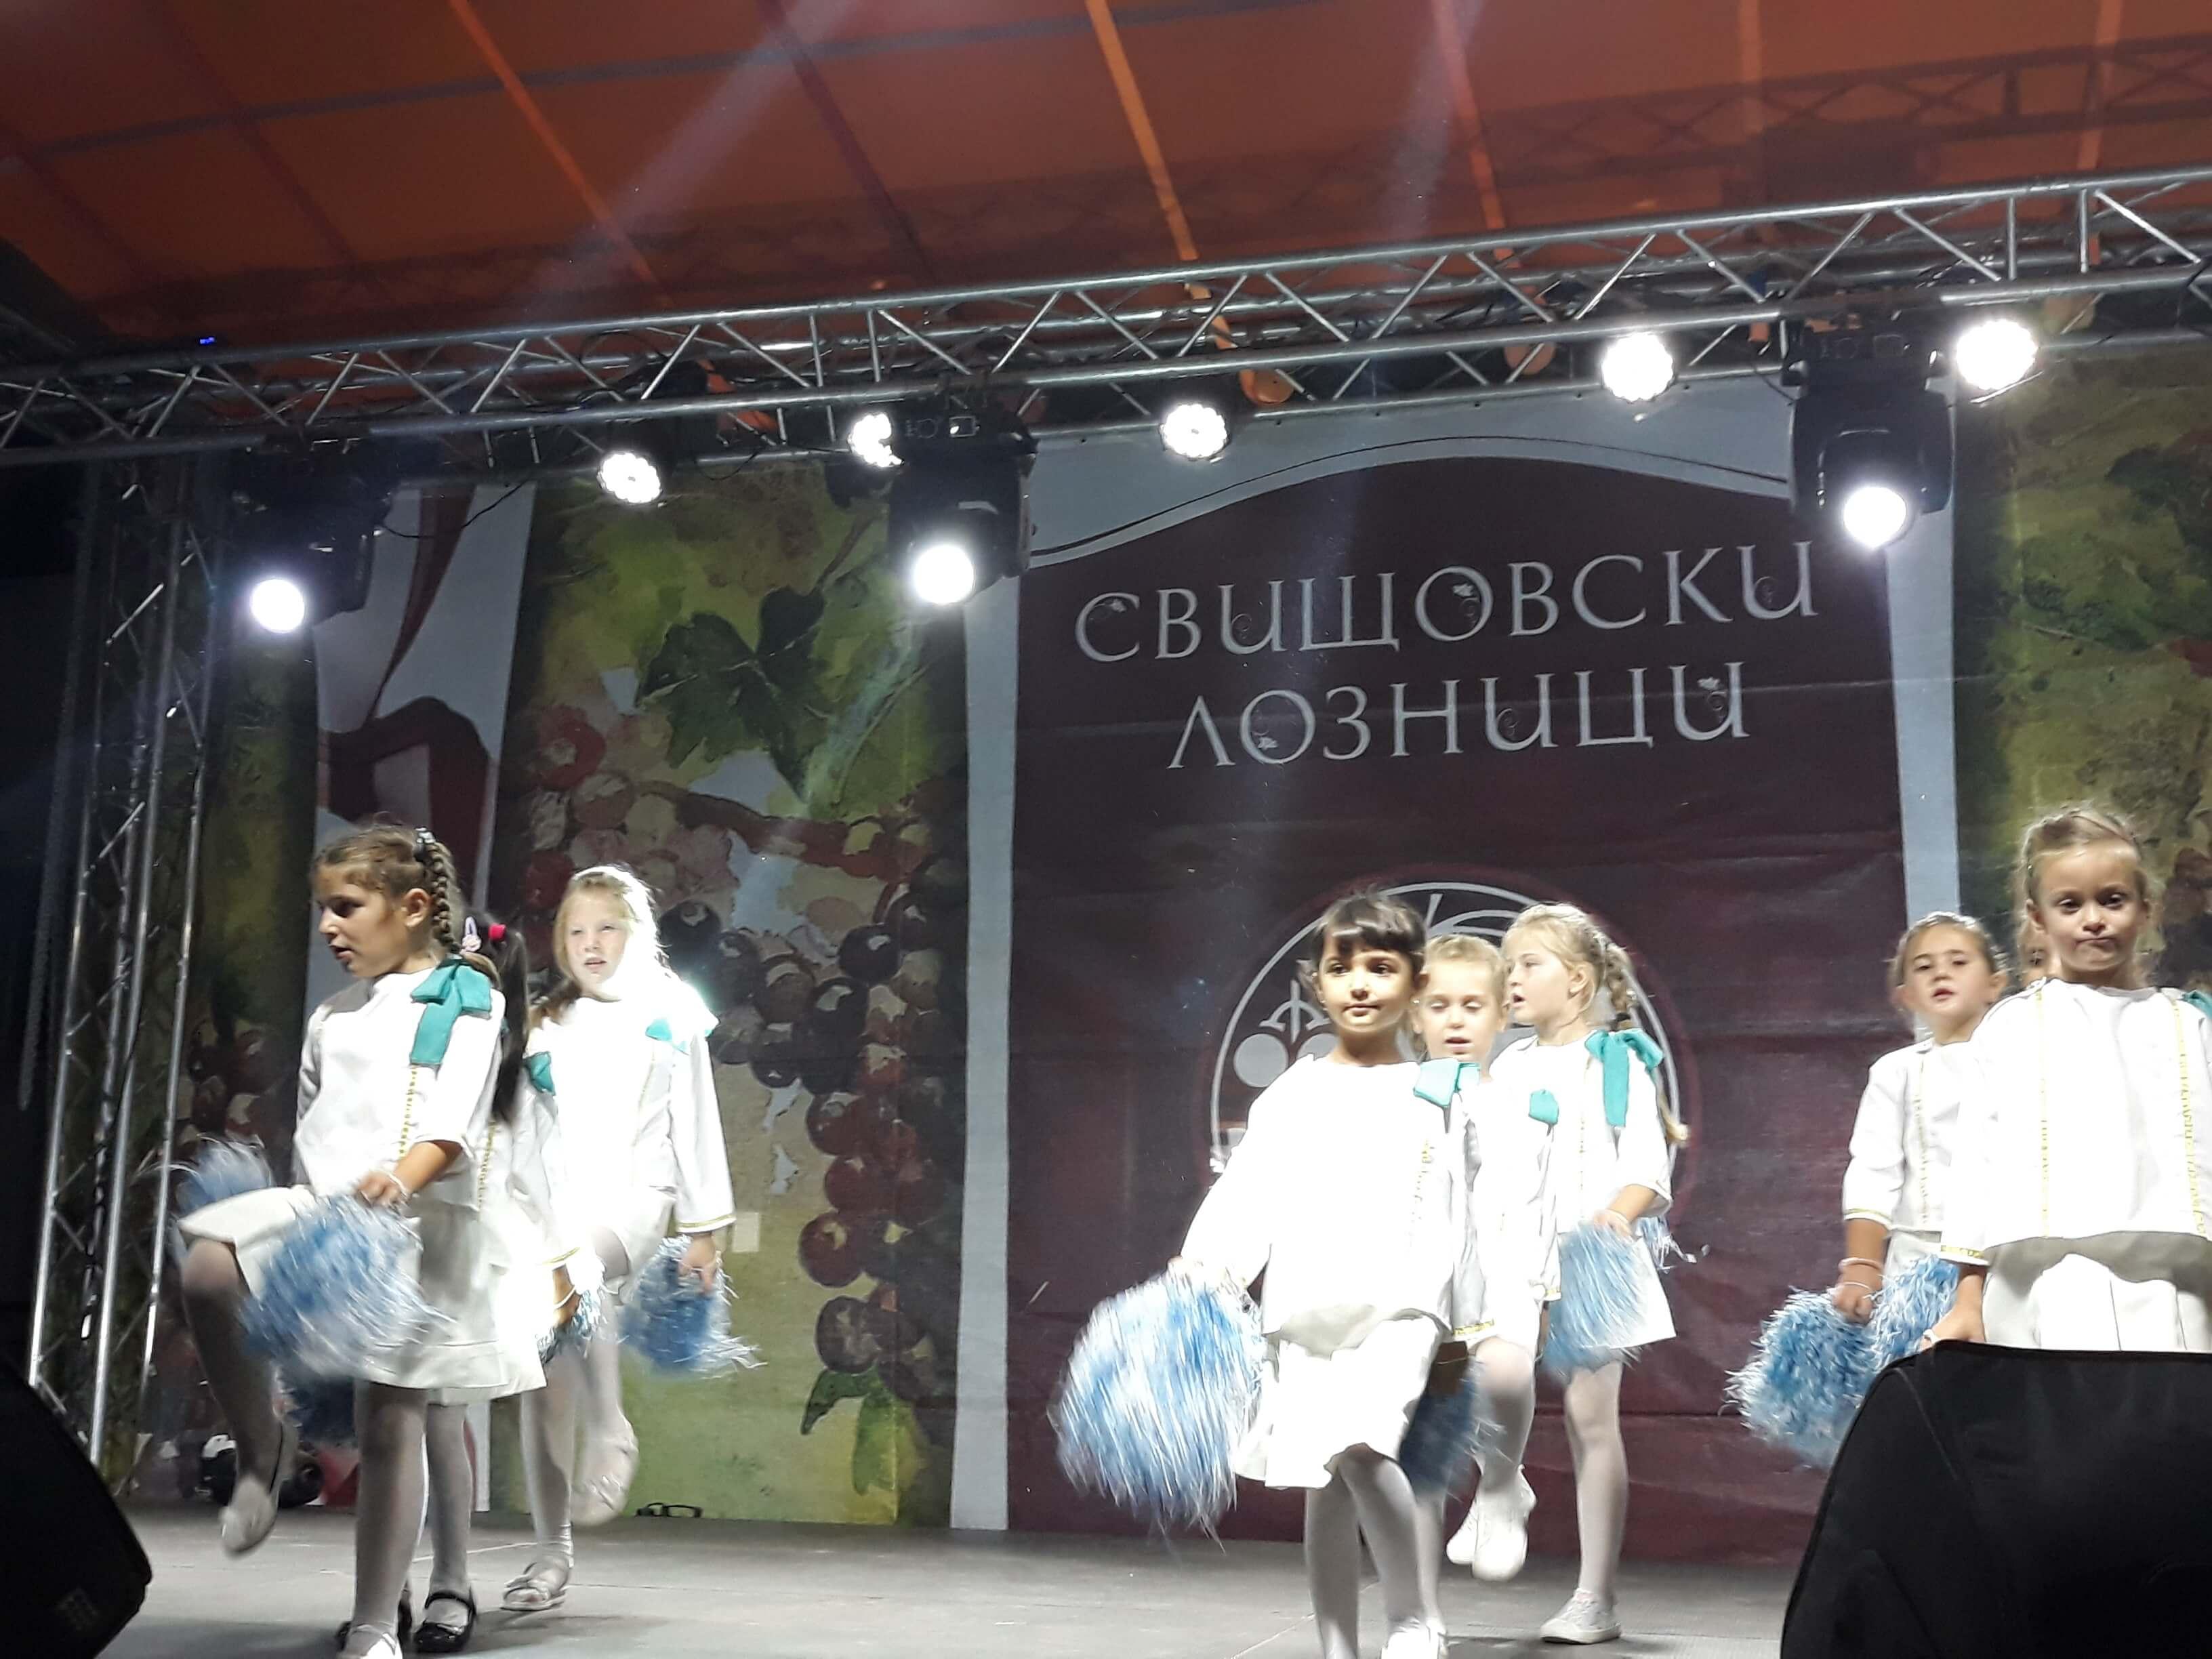 Свищовски лозници 2019 културна програма